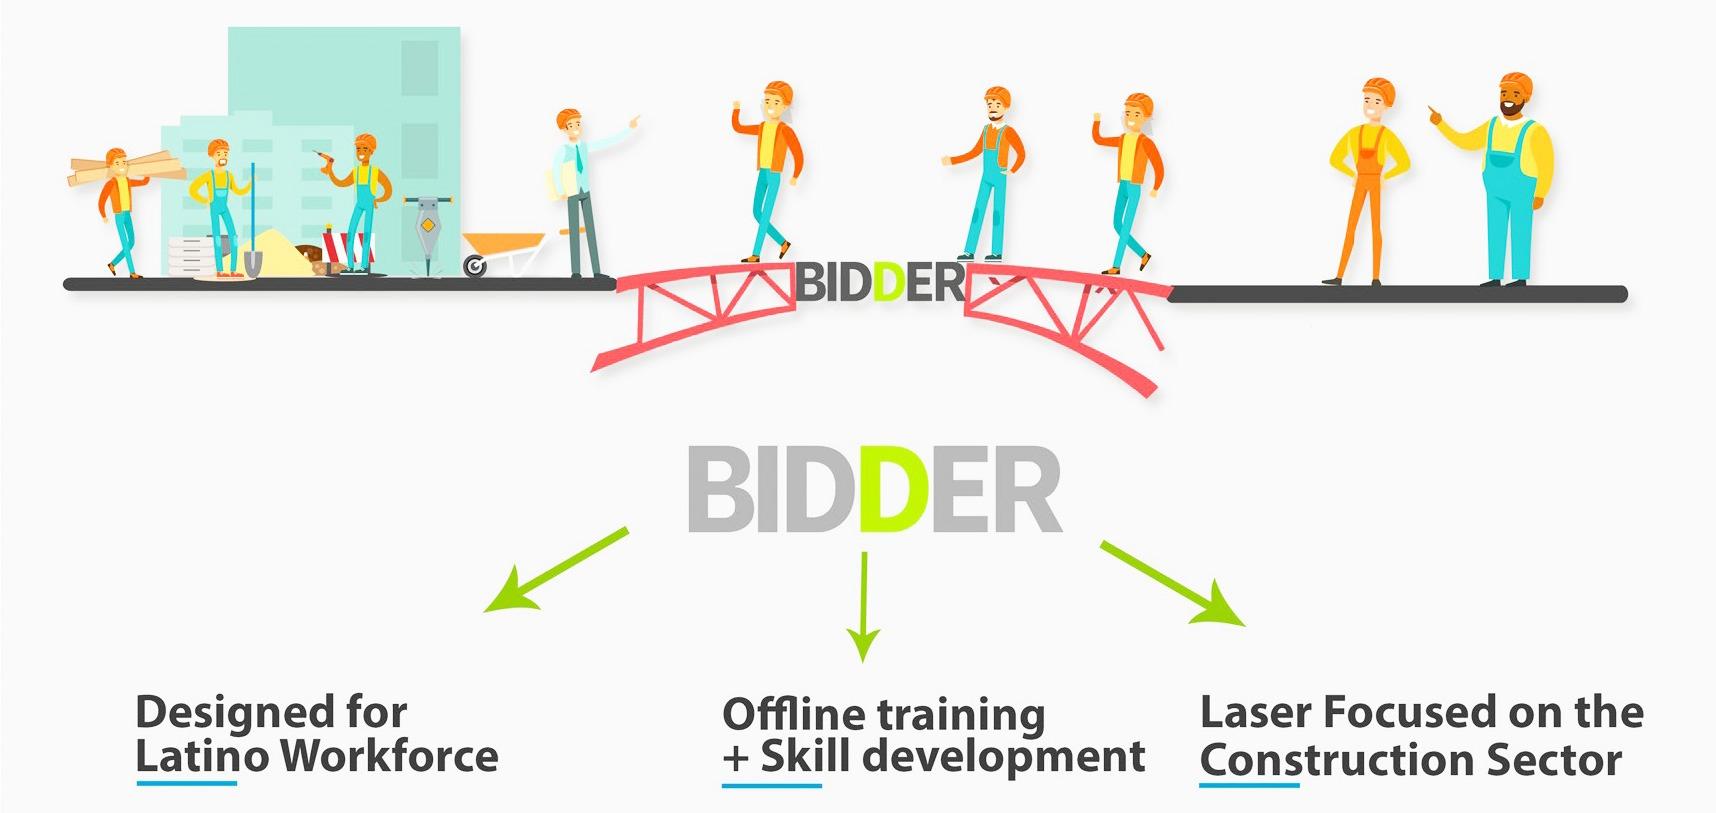 bridge-bidder